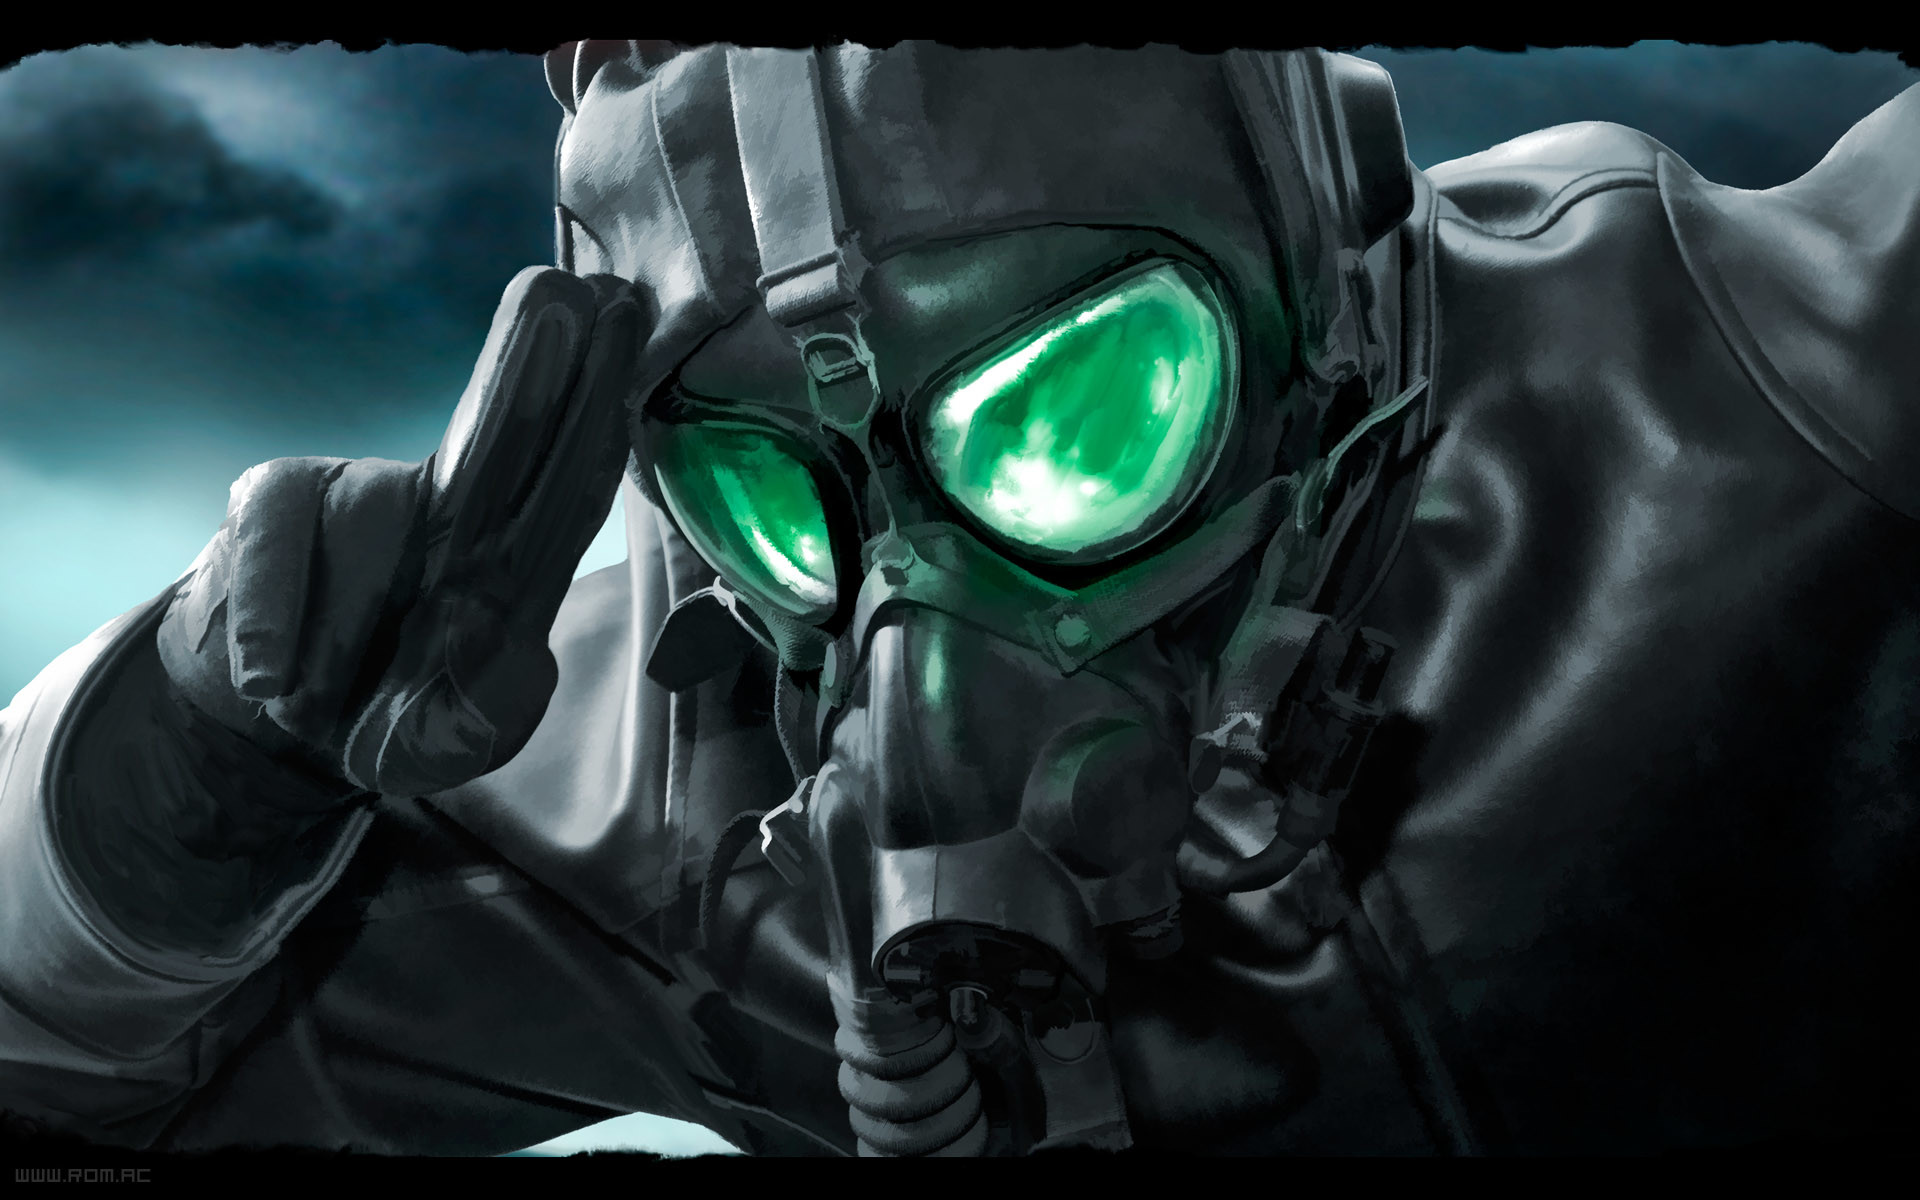 Res: 1920x1200, Dubstep Gas Mask Wallpaper Hd - smokescreen